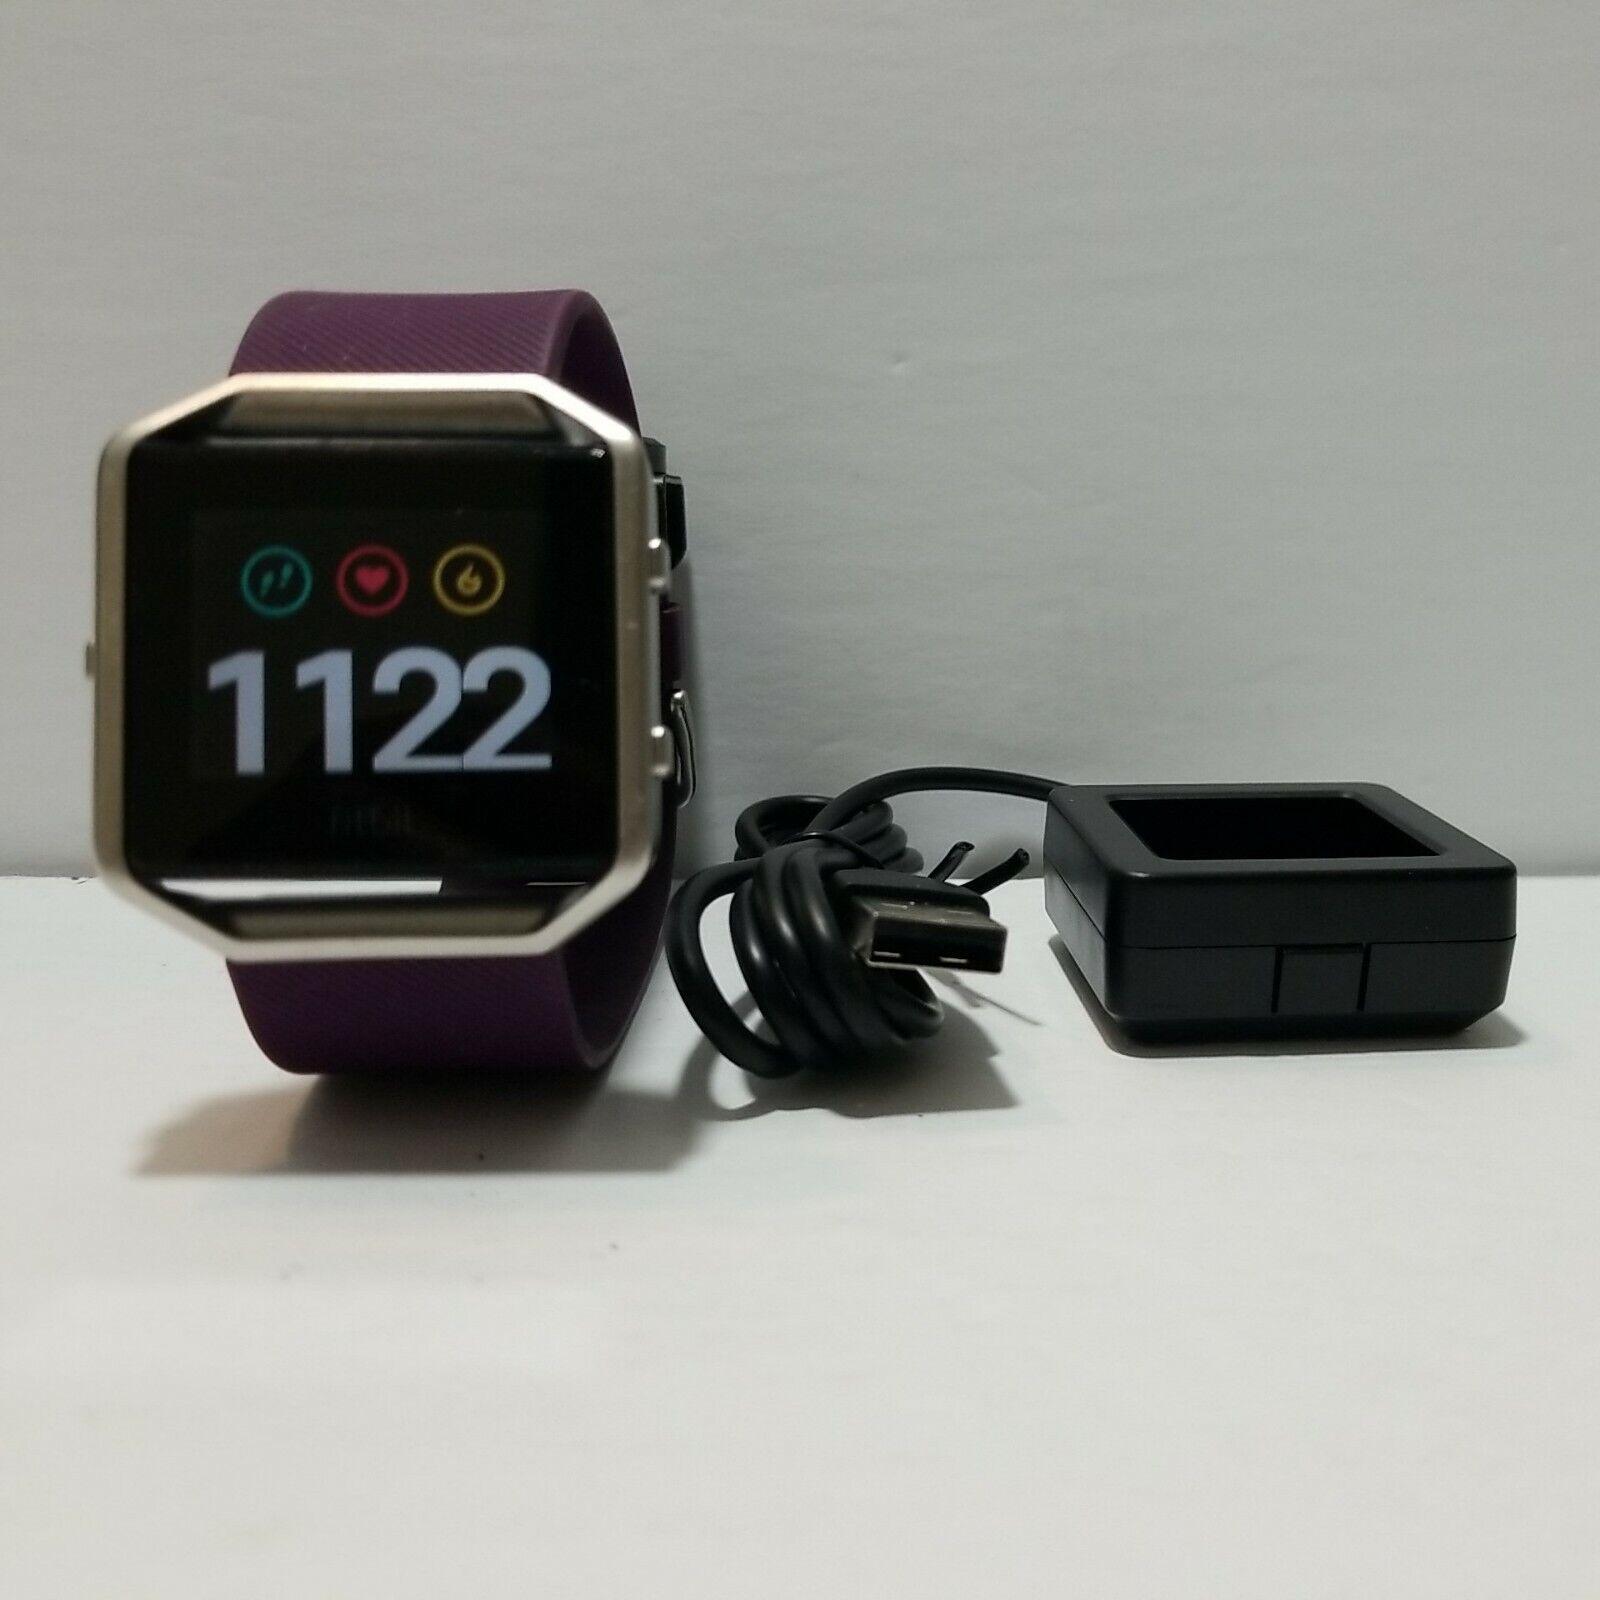 Fitbit Blaze Smart Fitness Watch Activity Tracker. Plum Large Band.